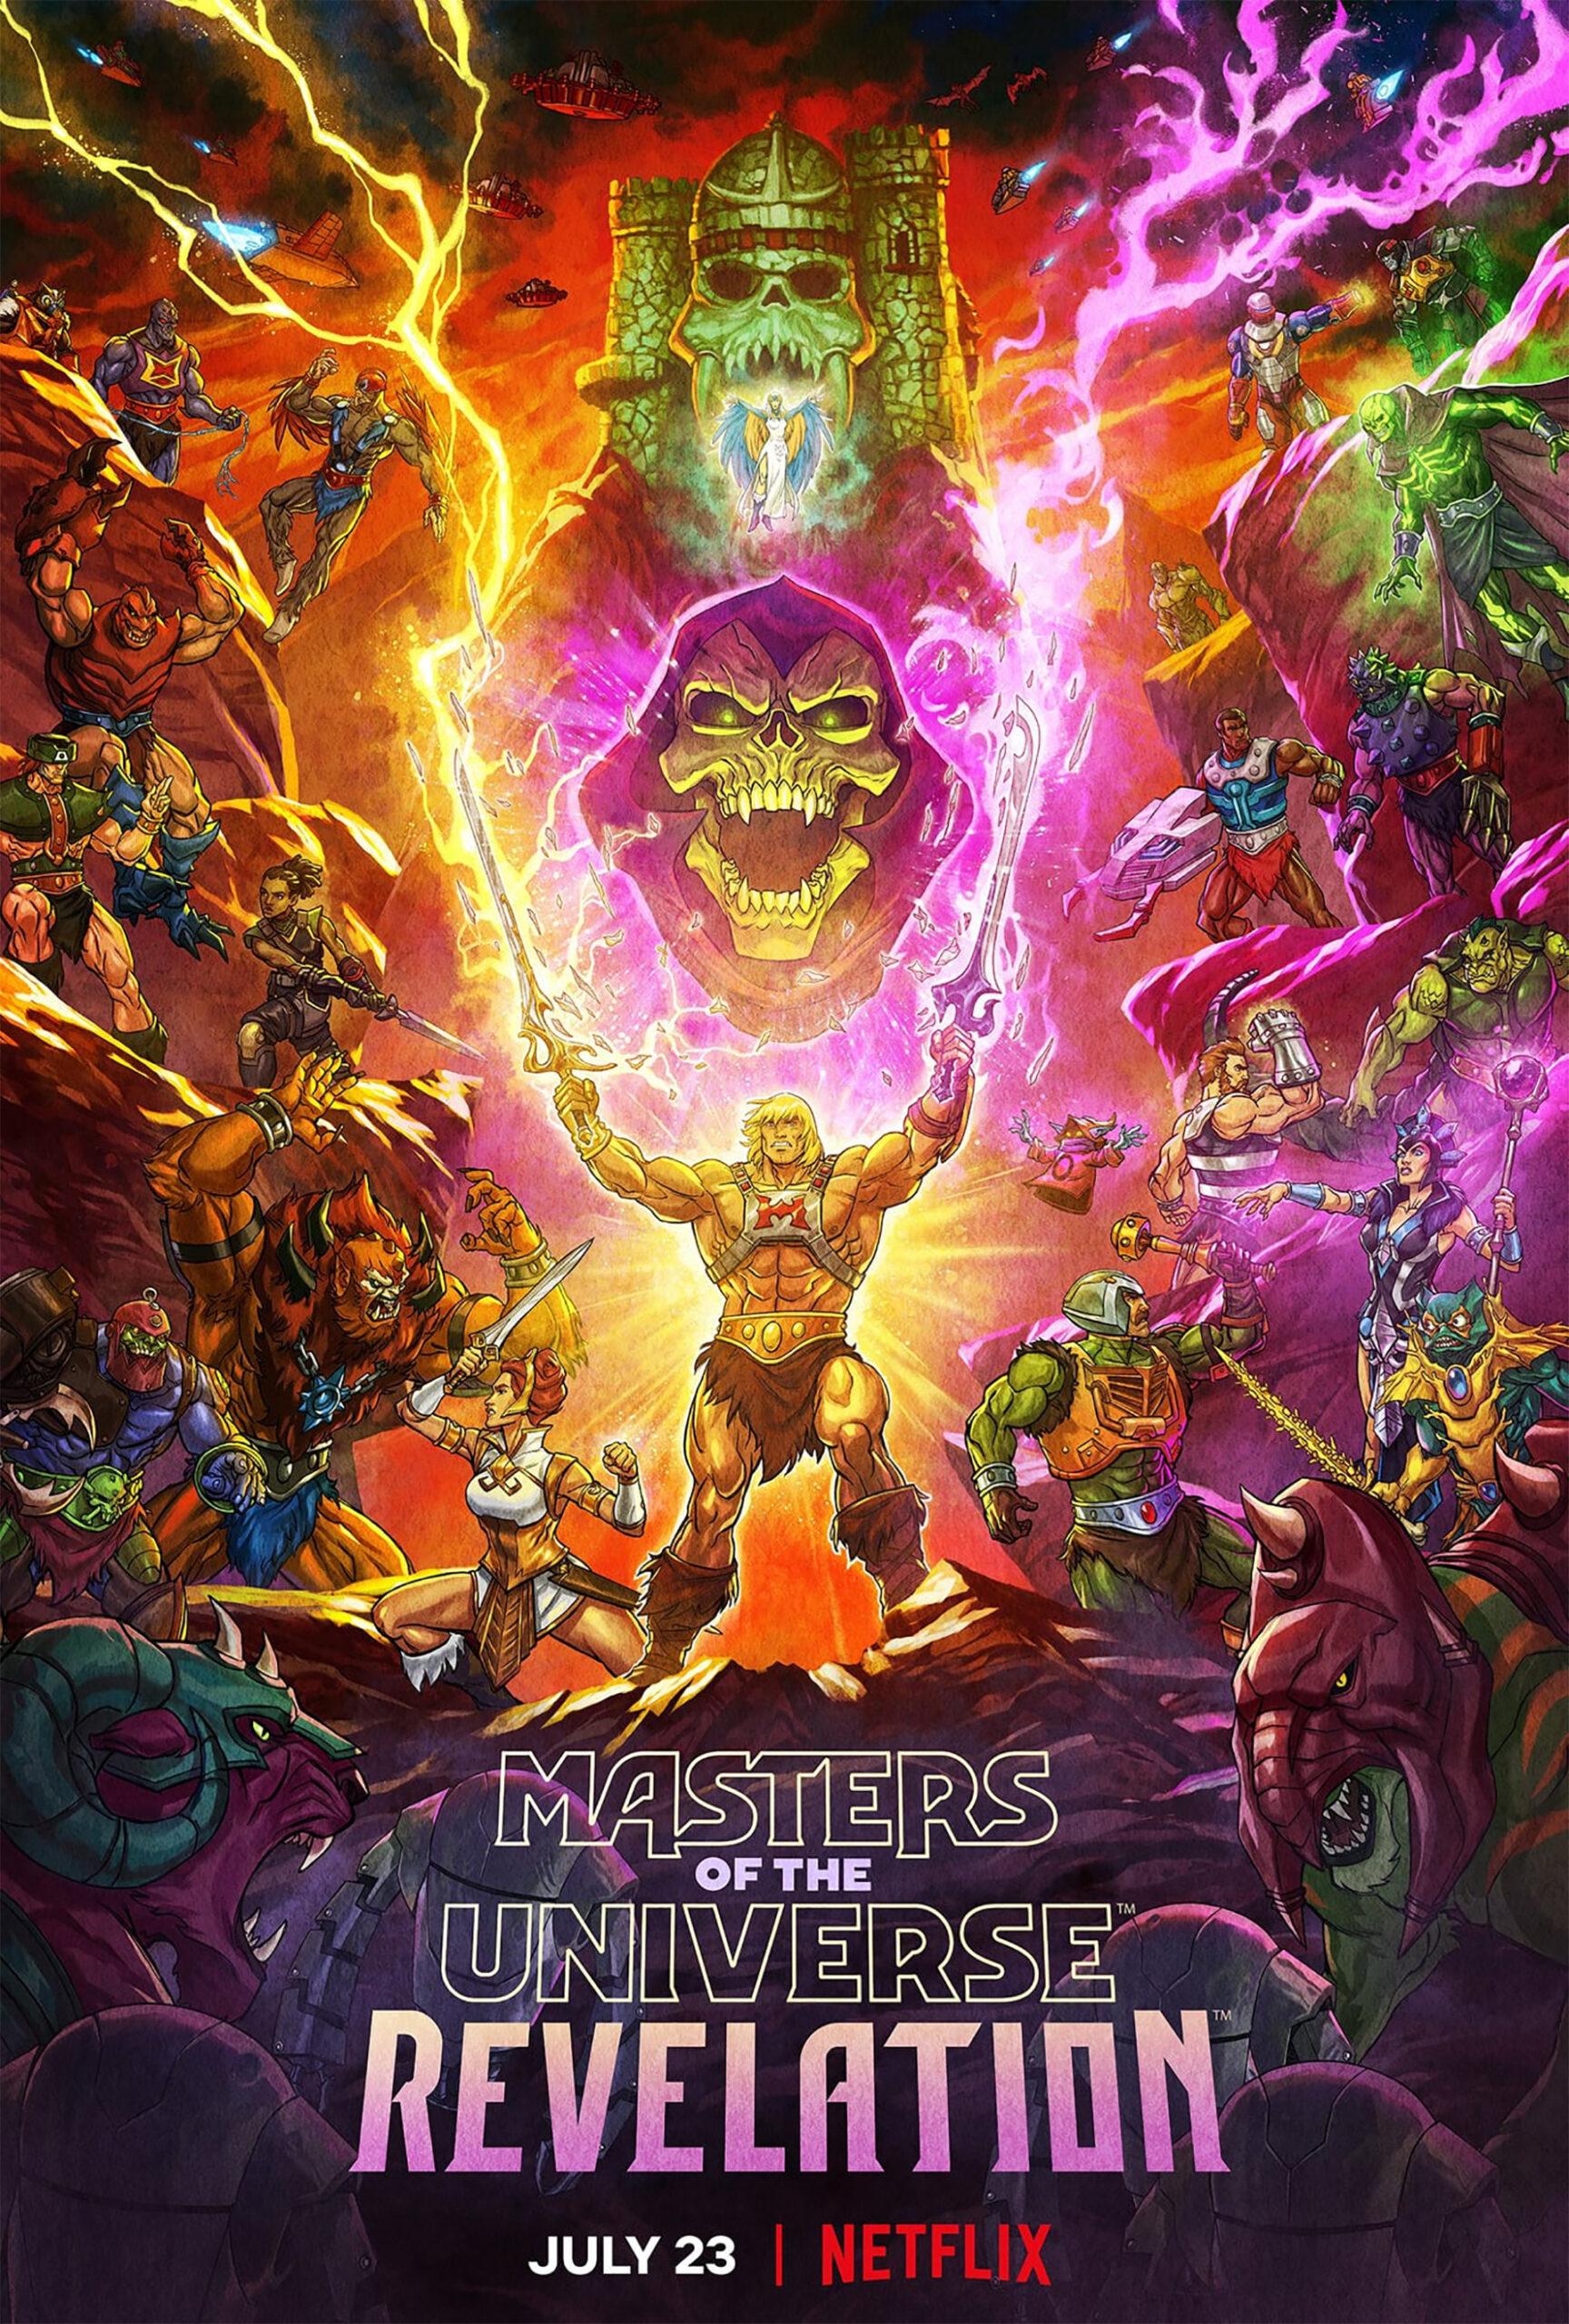 master universe revelation review bombing